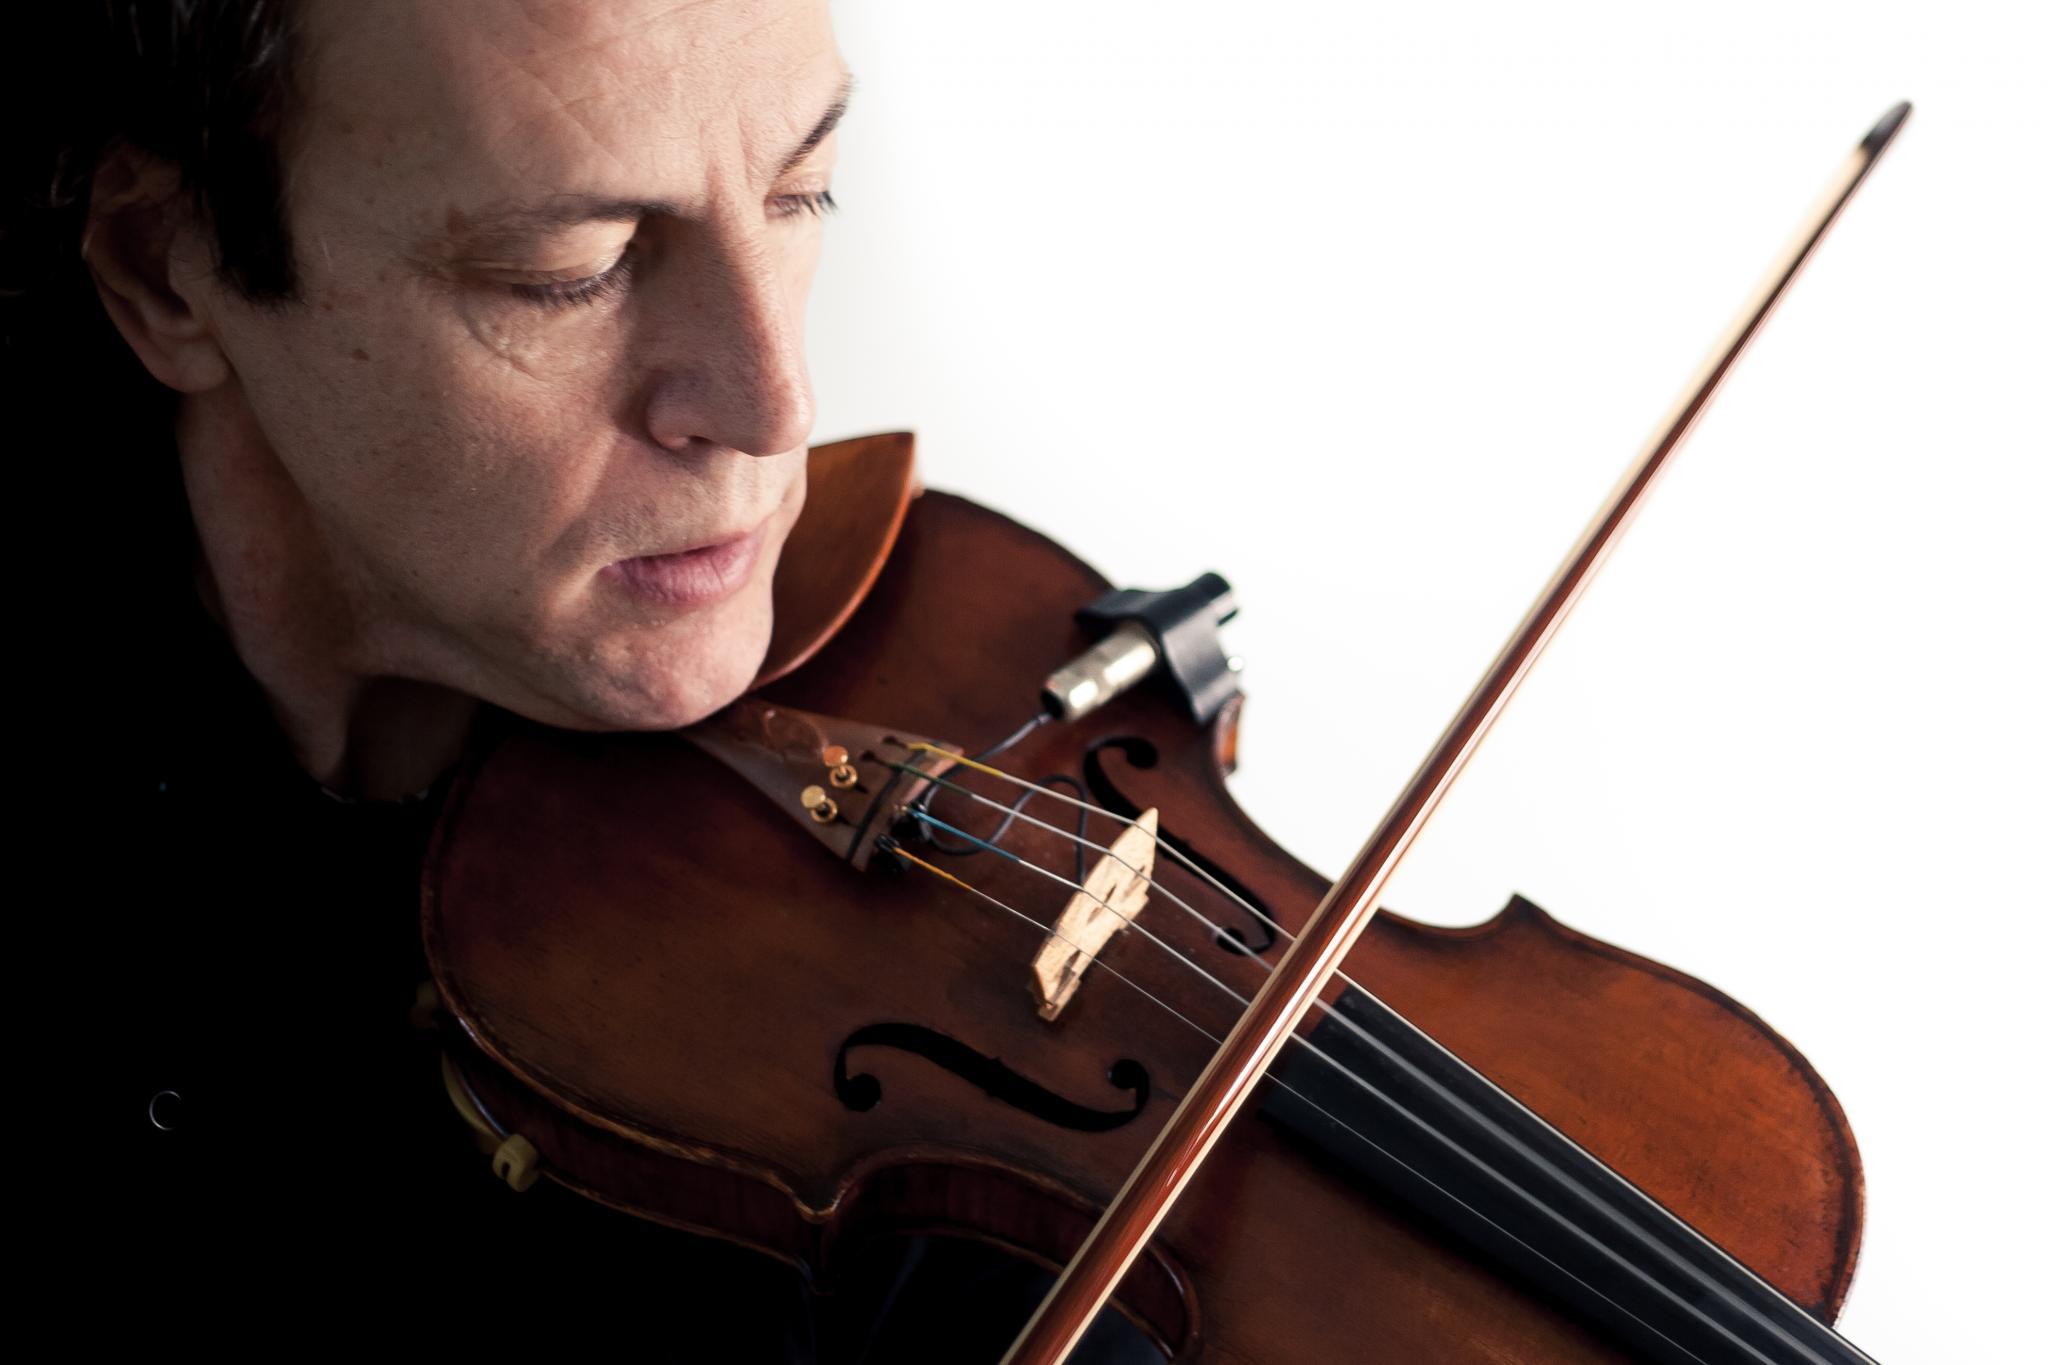 Stefano Sicolo spielt Violine